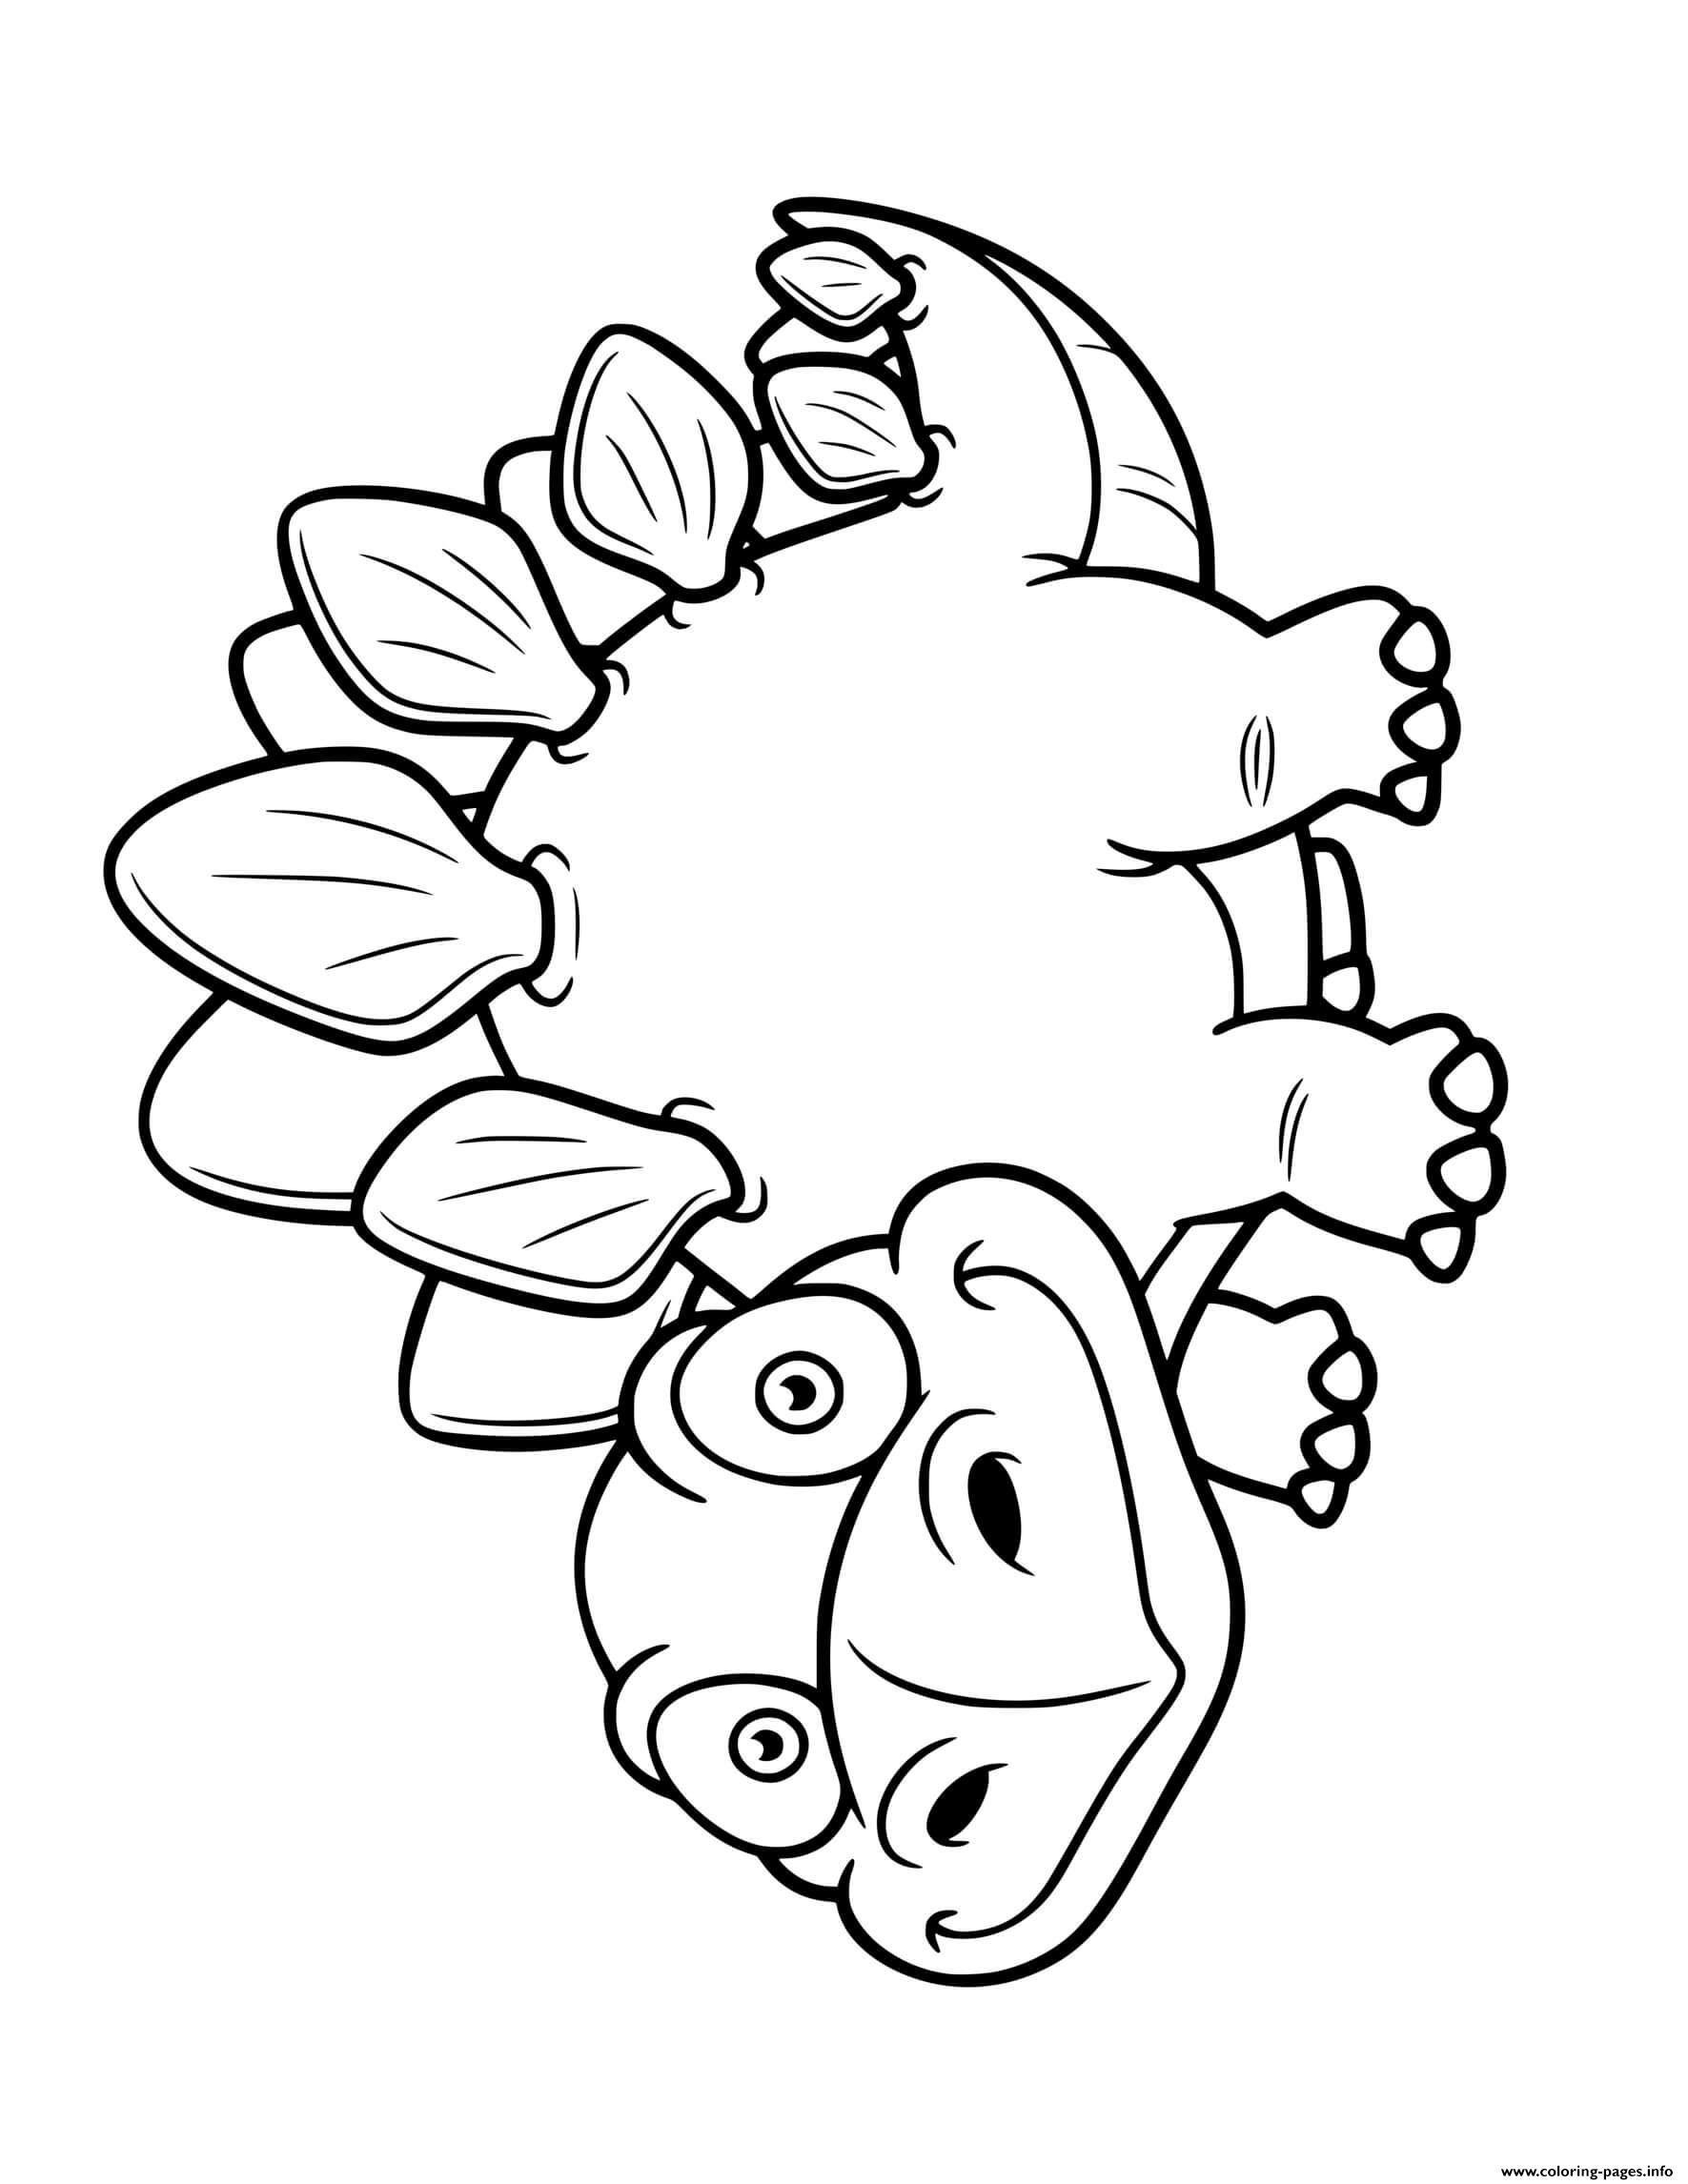 Dinosaur Cute Cartoon Stegosaurus Coloring Pages Printable